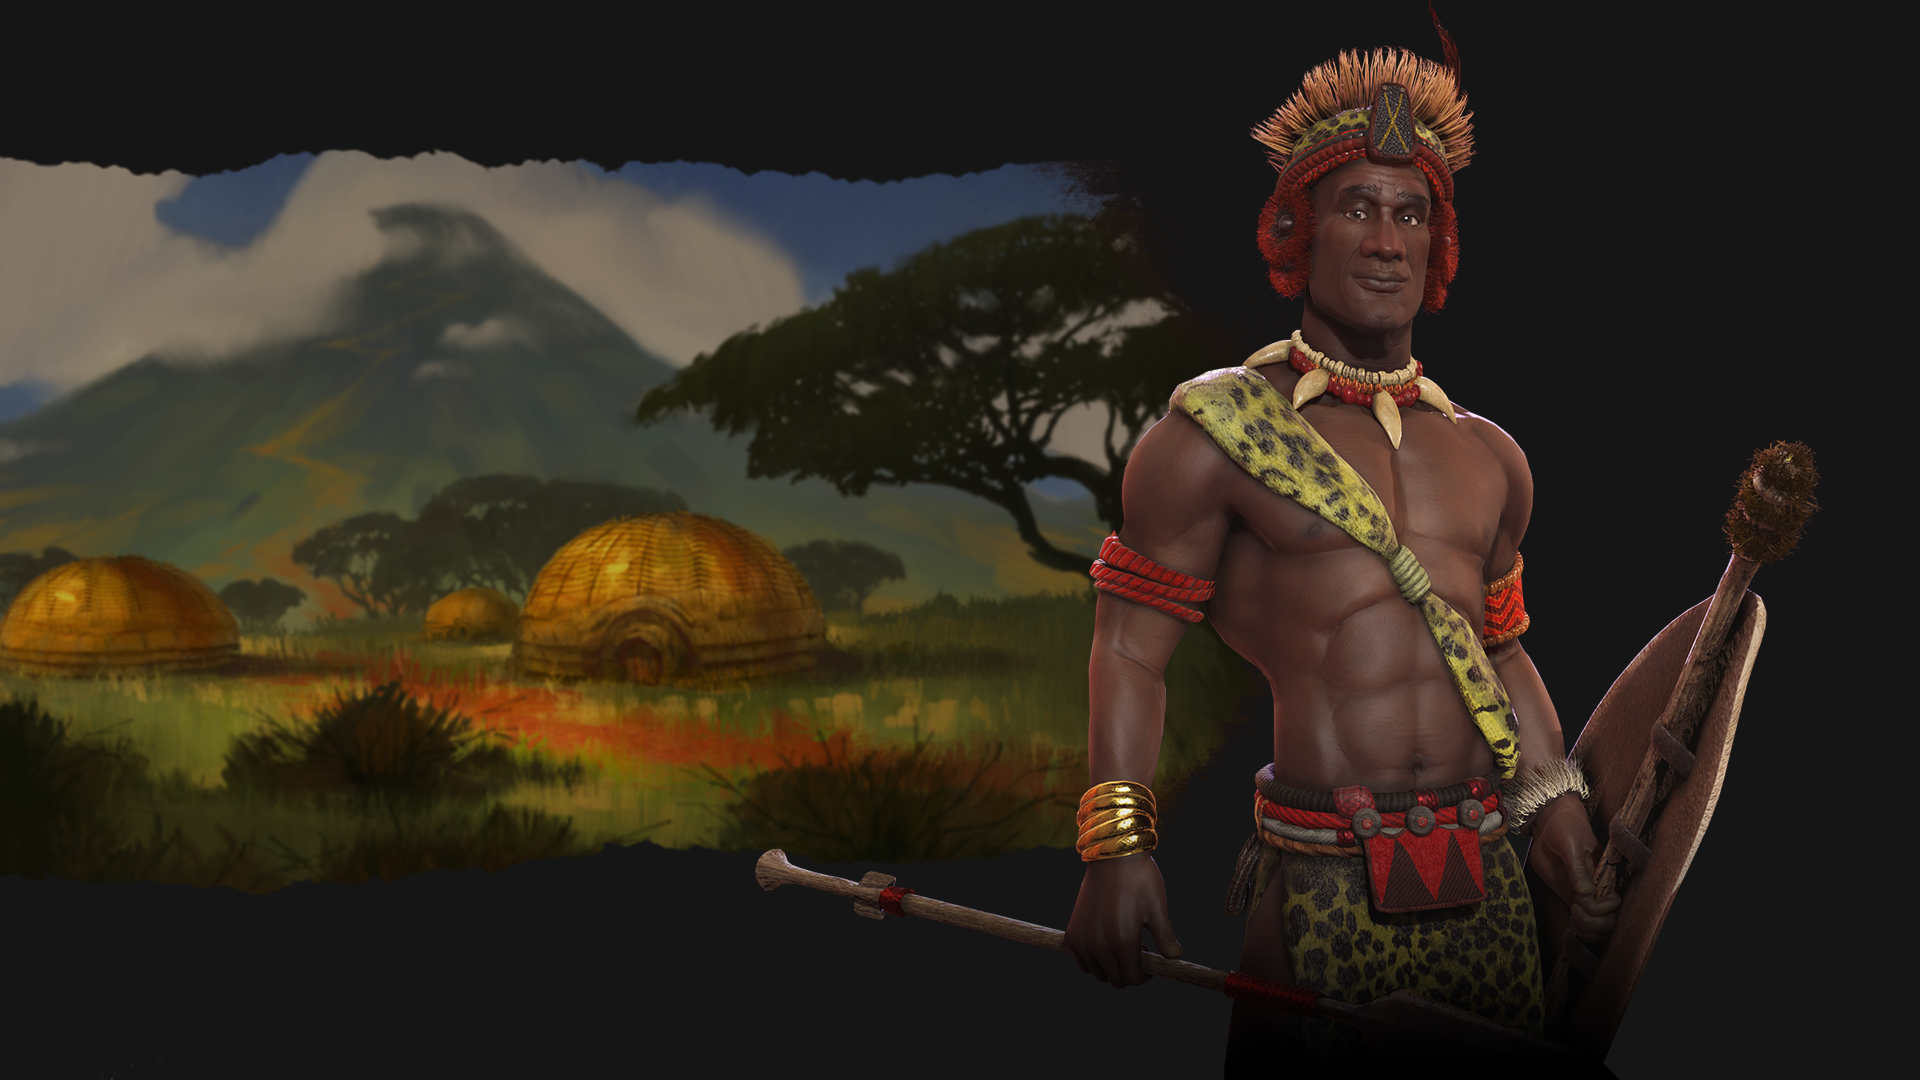 when shaka zulu died